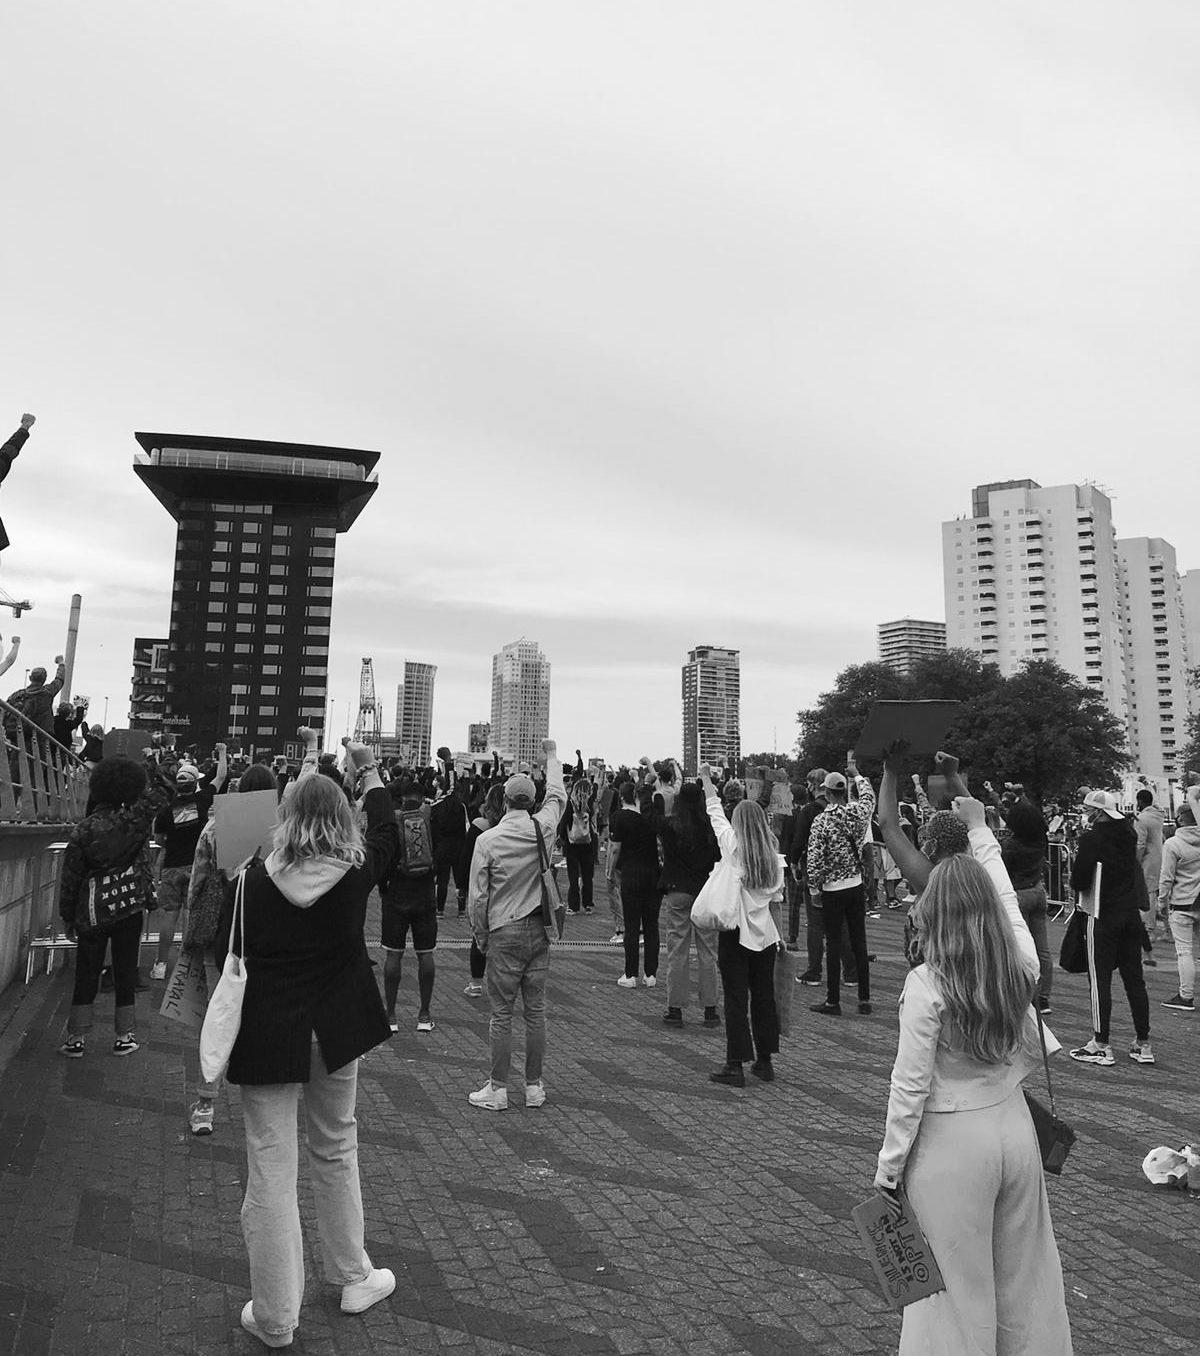 protest racisme rotterdam